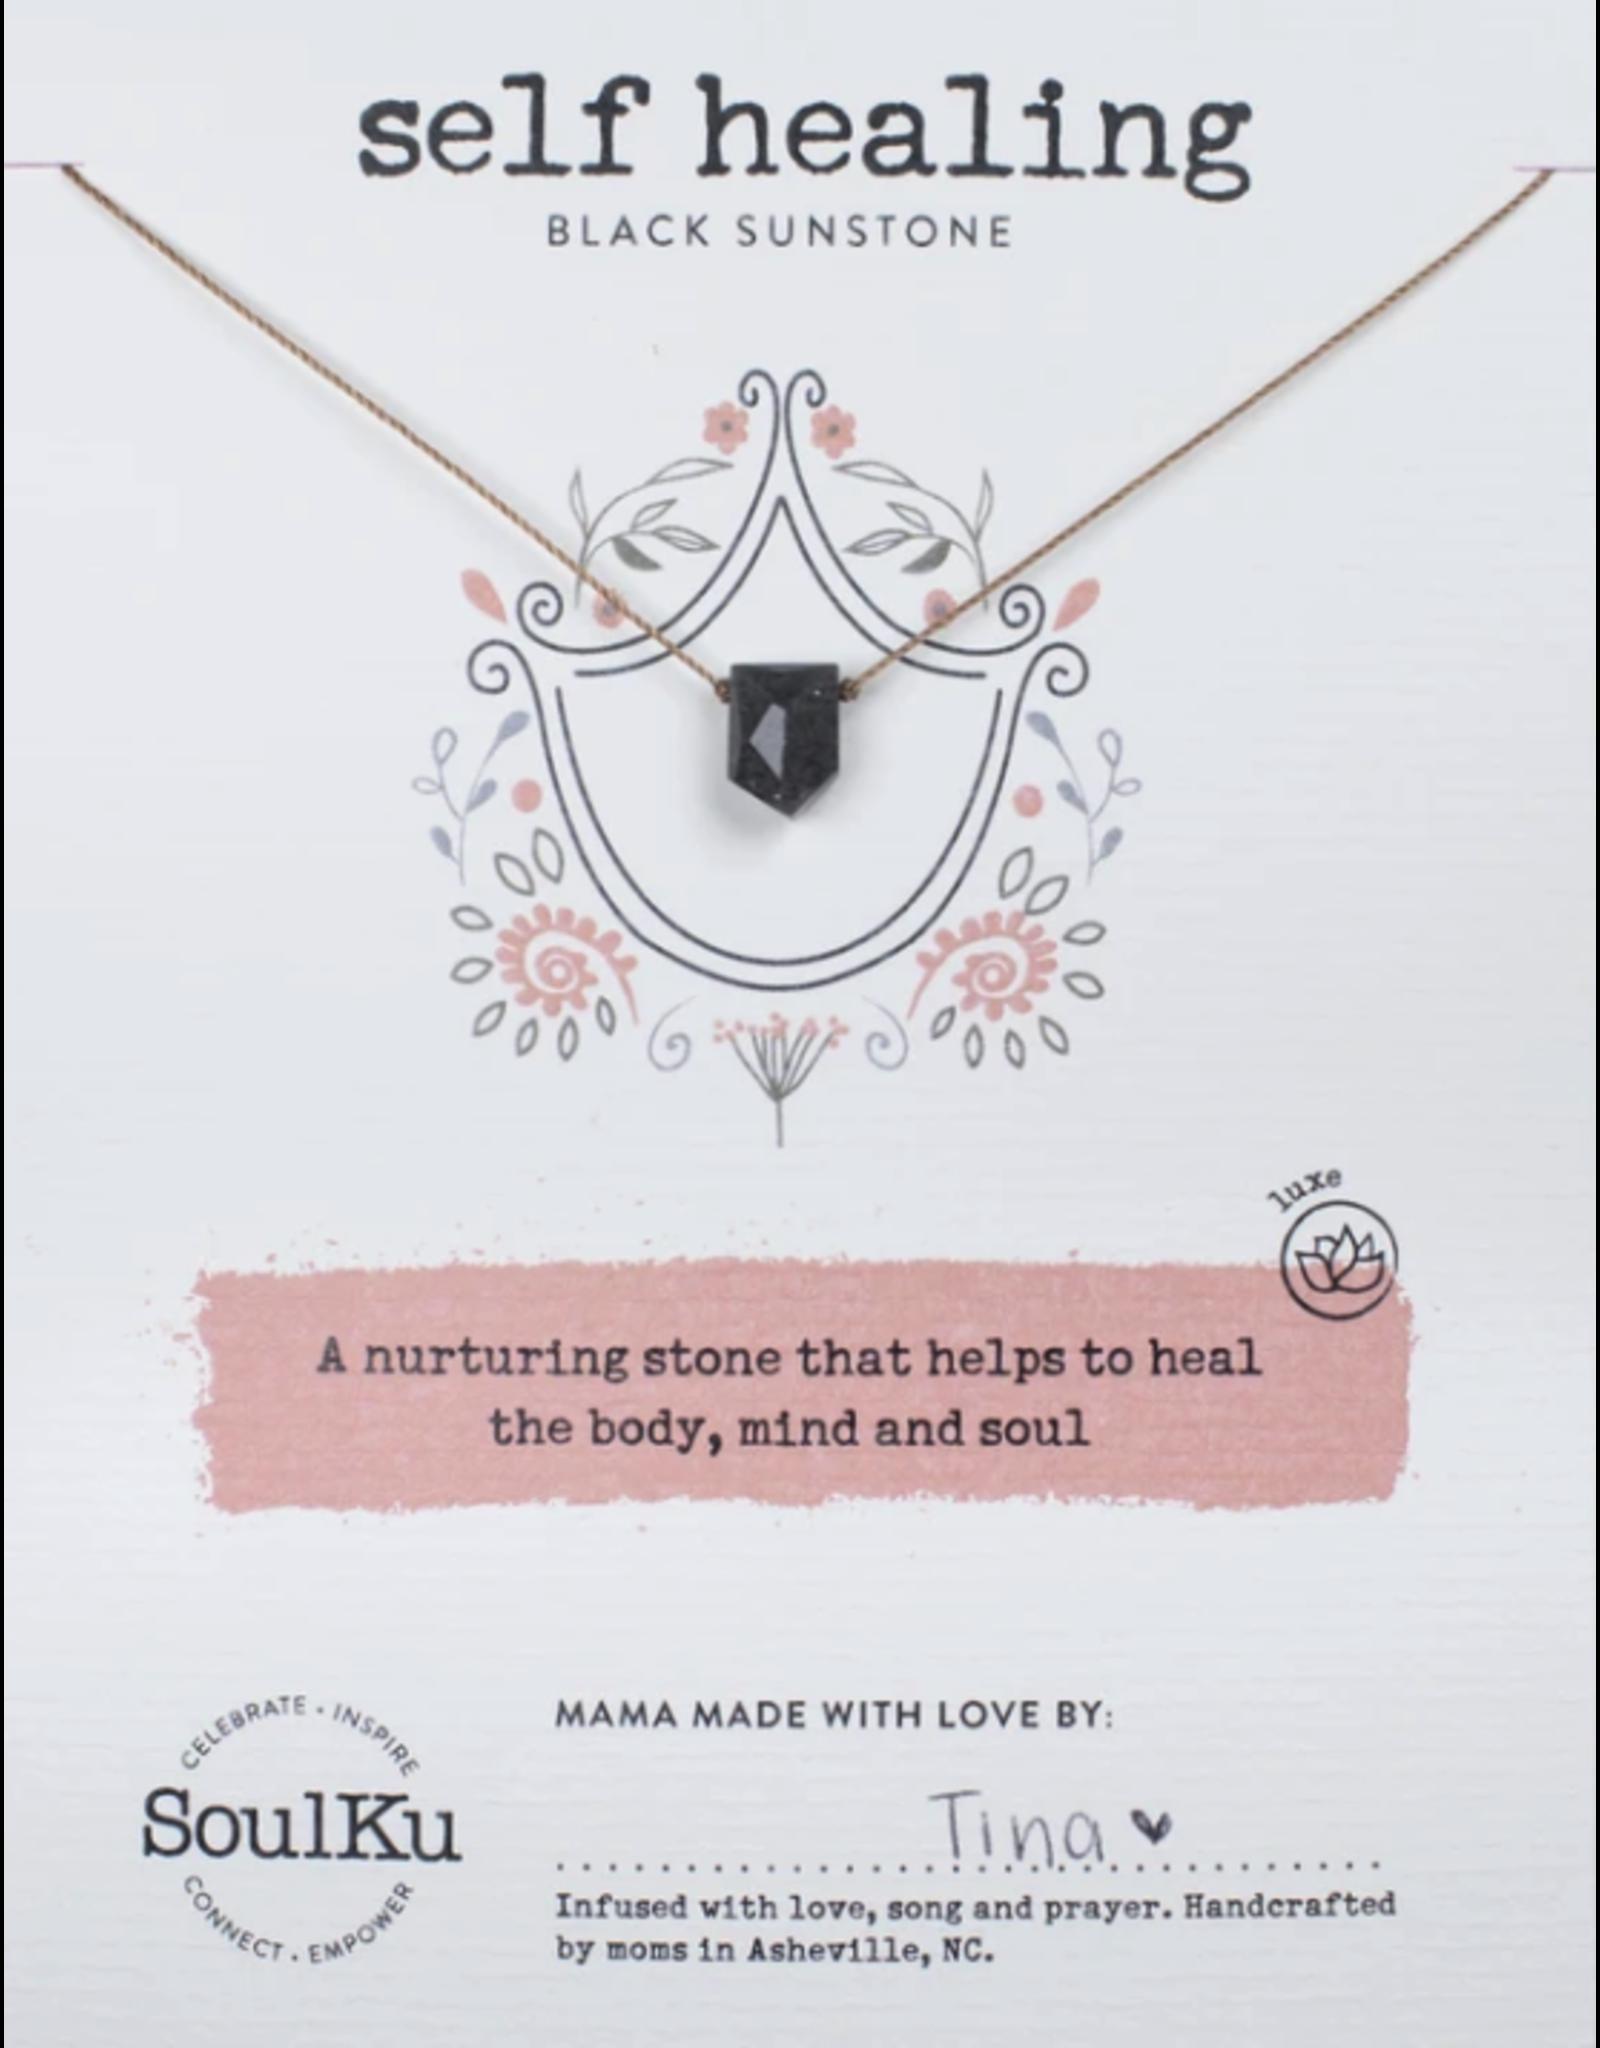 Black Sunstone Warrior Stone Necklace For Self Healing - SoulKu